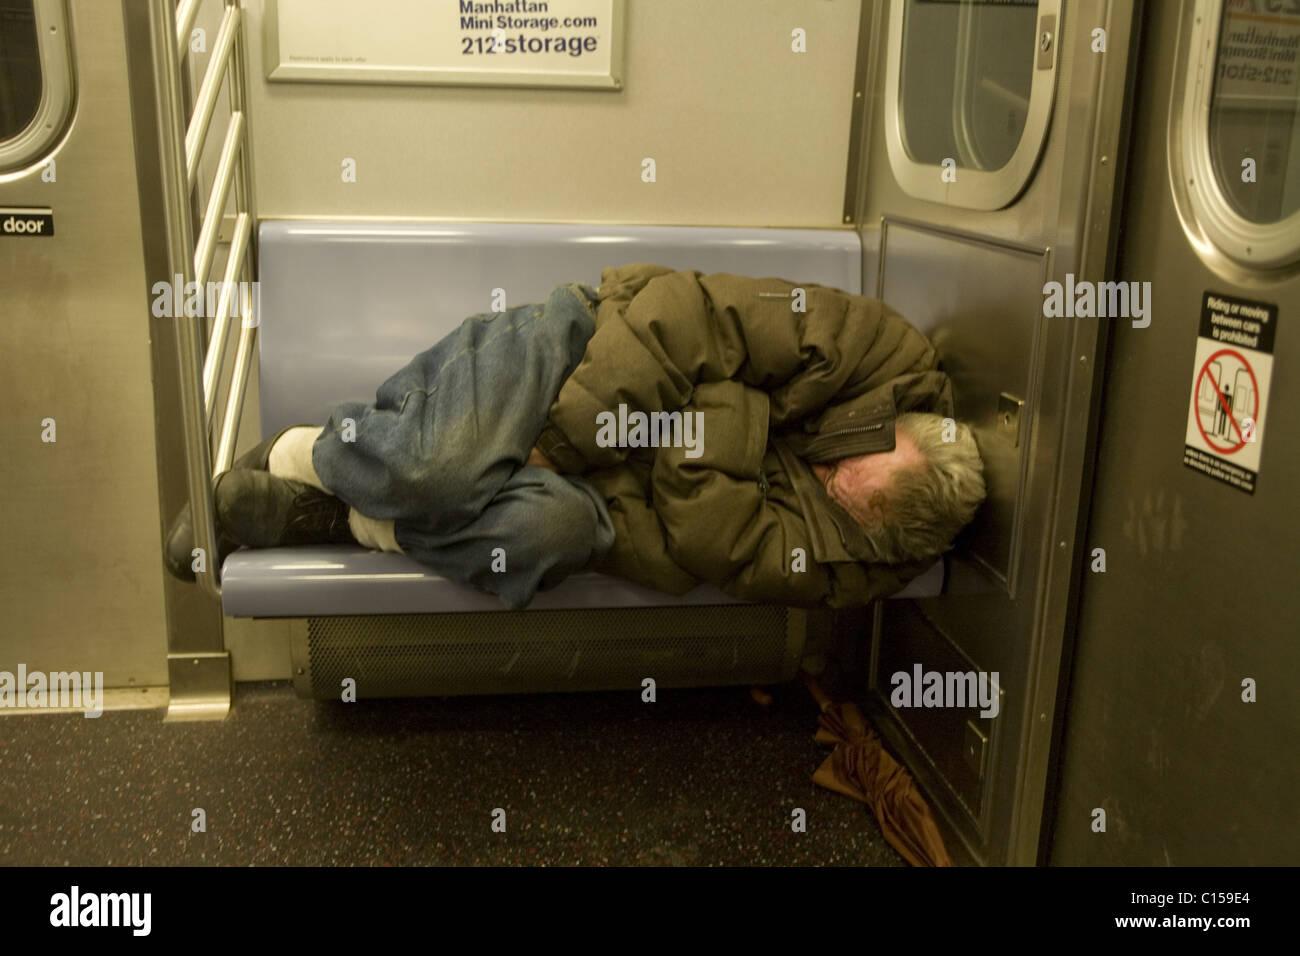 Homeless man sleeping on a New York City subway train - Stock Image